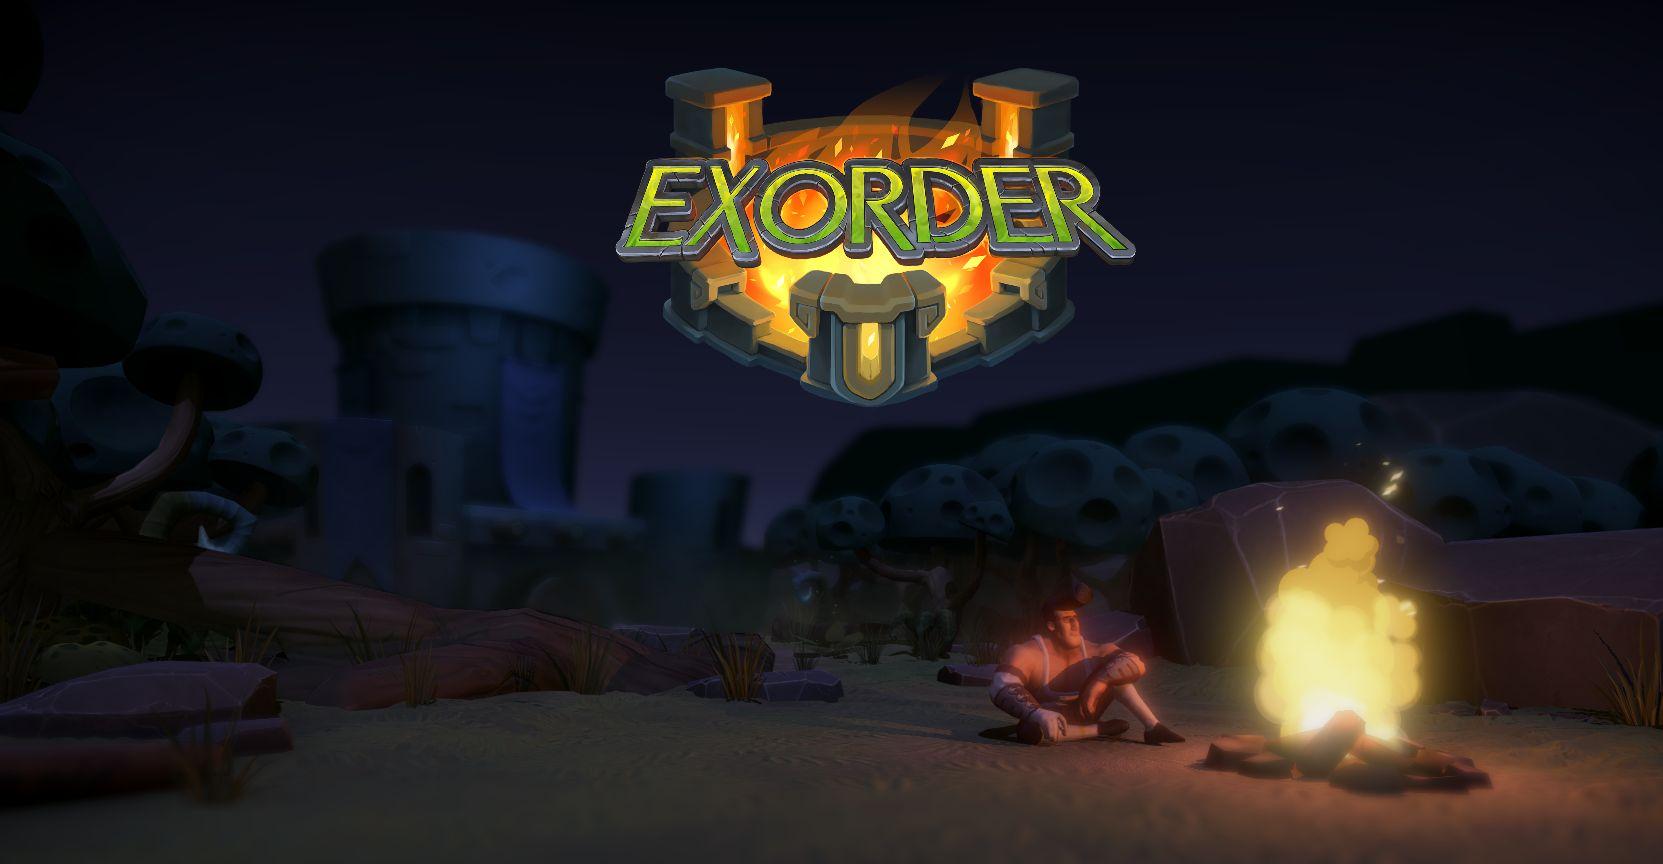 exorder 3